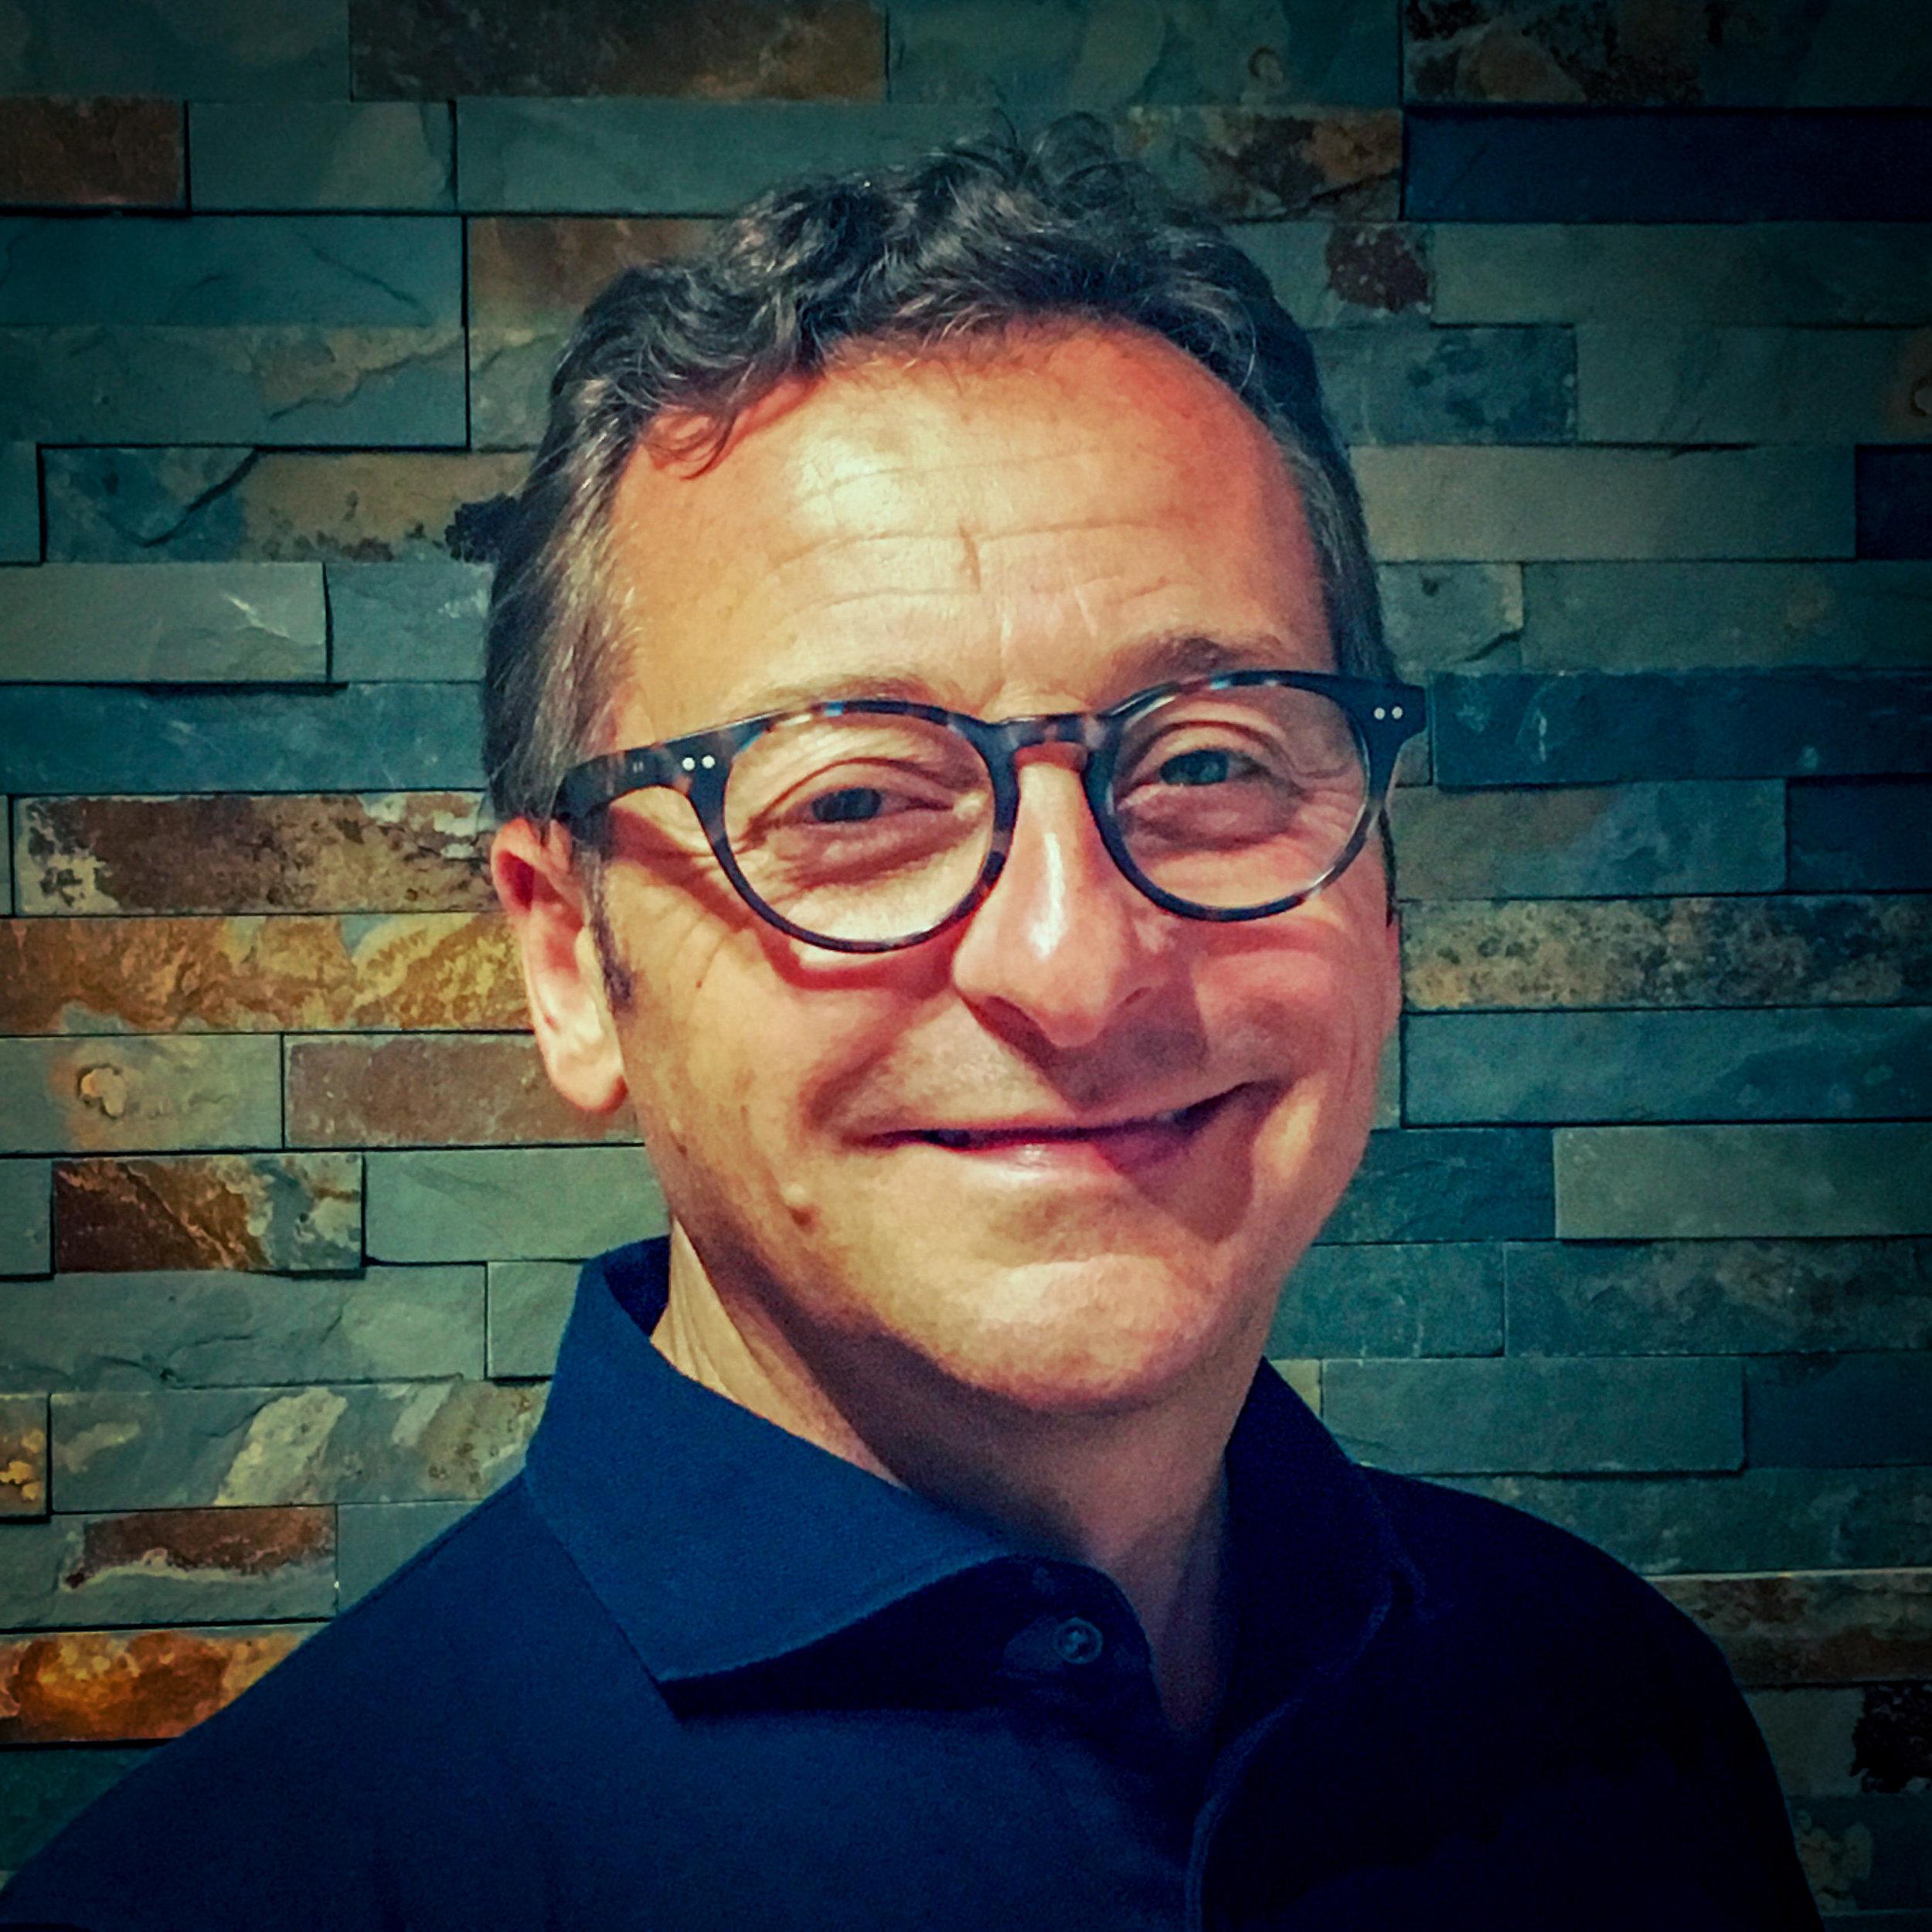 "<a href=""https://www.linkedin.com/in/benglia"" target=""_blank""><i><b>Marc-Antoine Benglia  </i></b></a><br>CEO<br><br><b>Kwilt</b><br>"